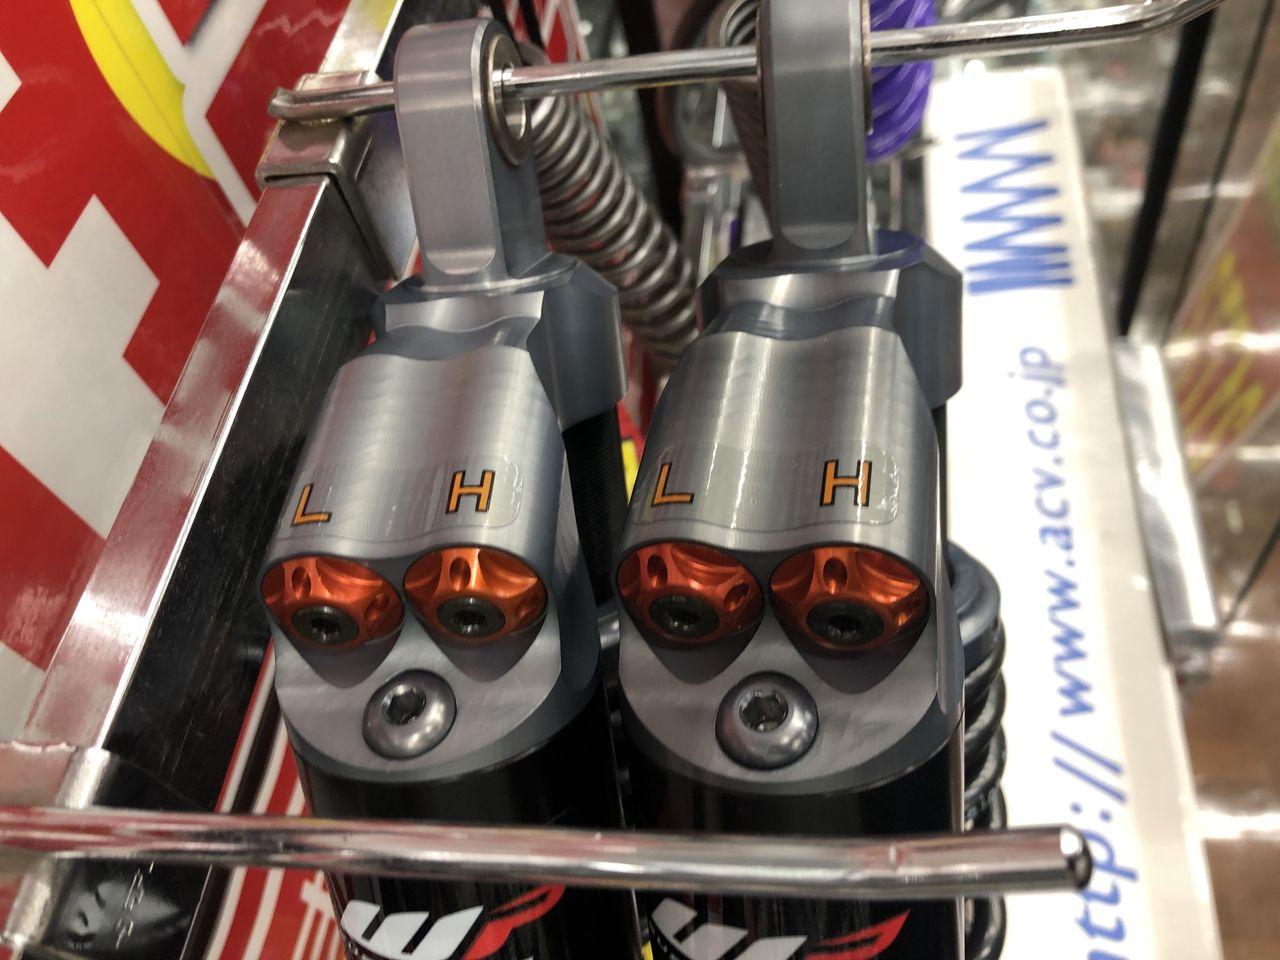 741EDC95-F56A-4A78-99A5-F052B09AB3ED